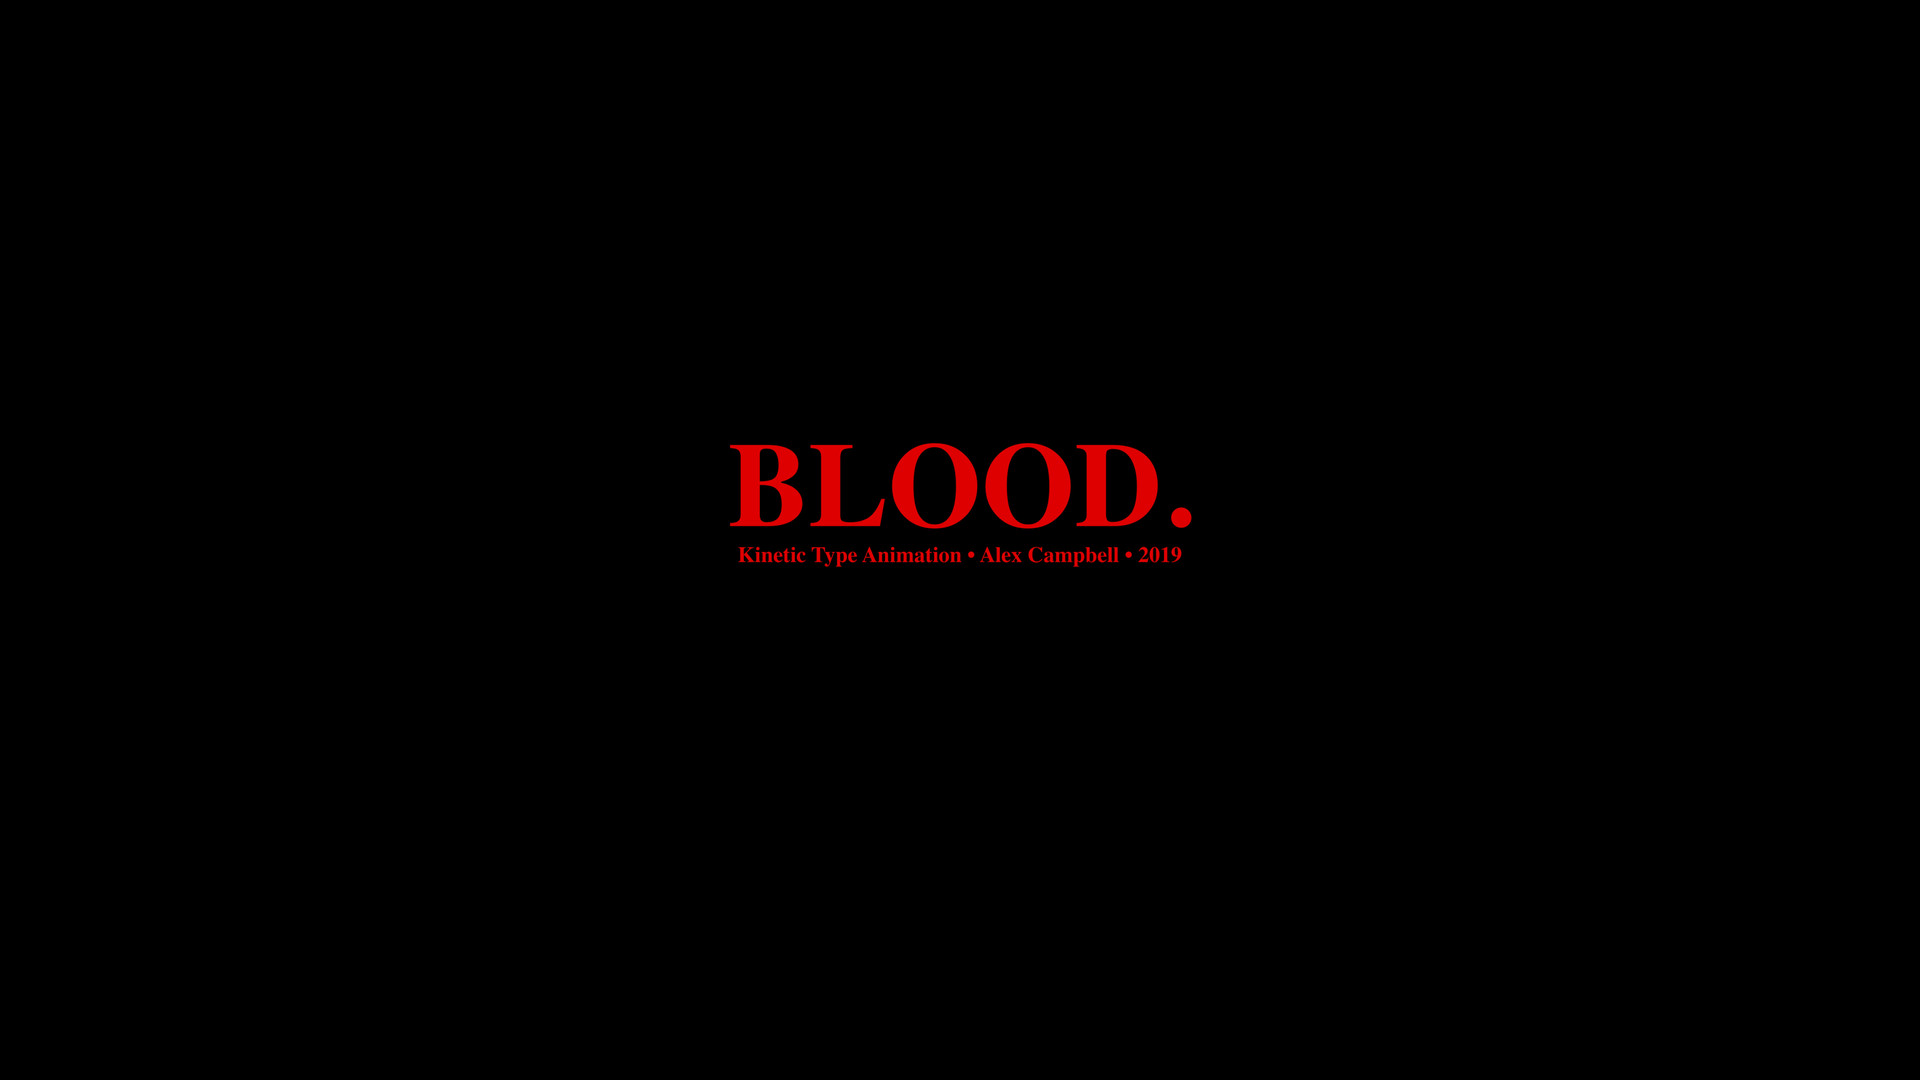 Blood_1.jpg